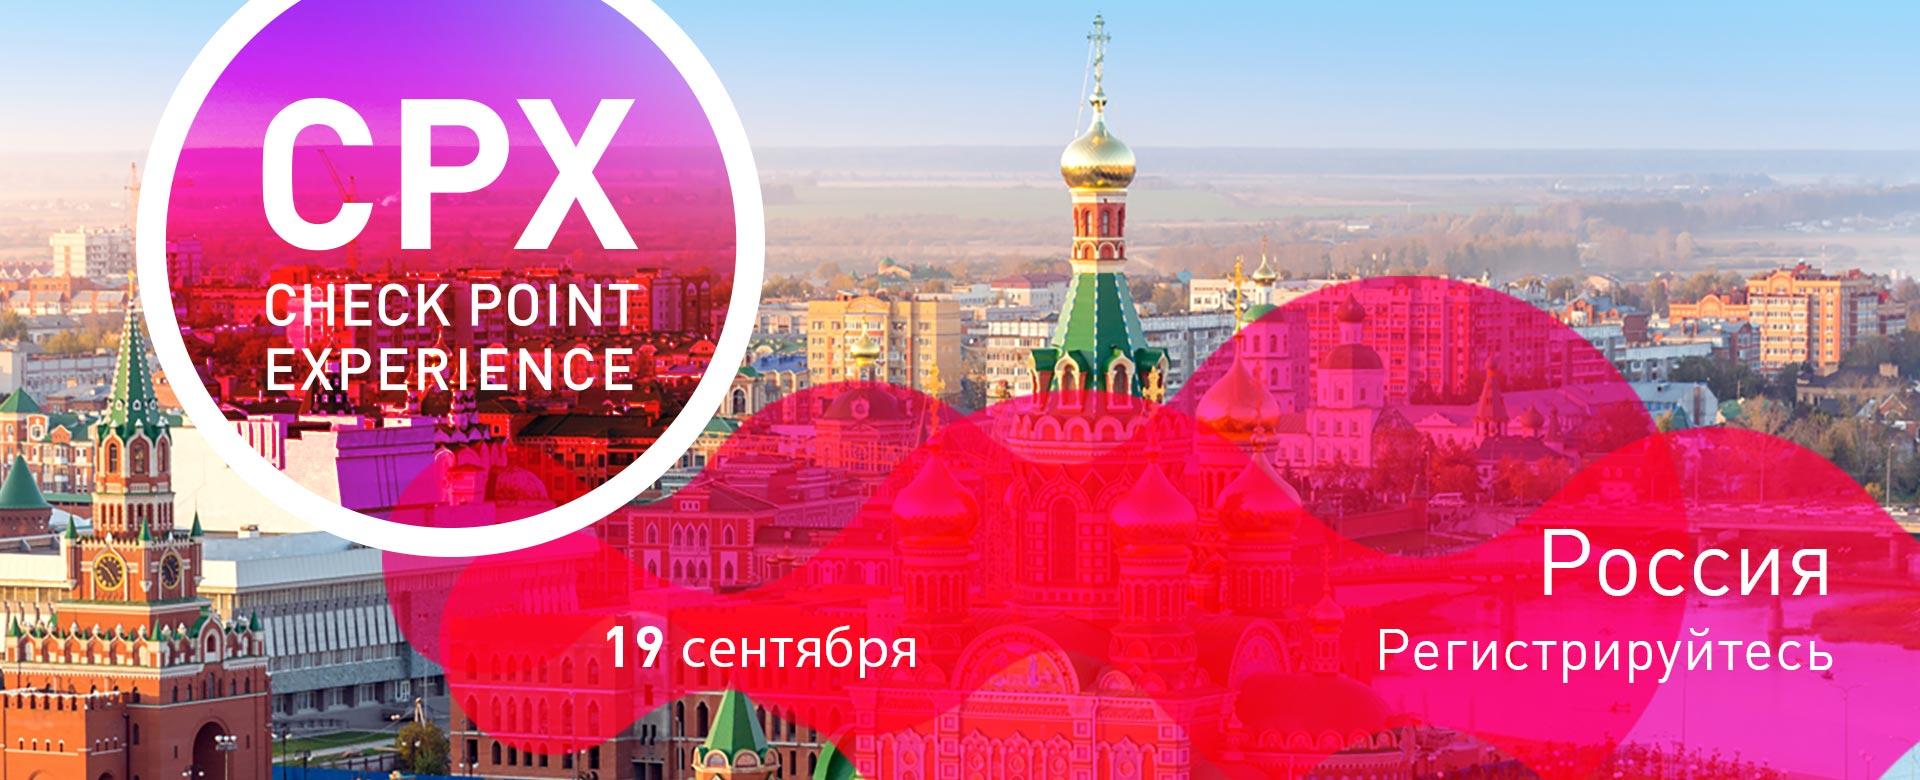 Check Point приглашает на конференцию CPX Россия 2019